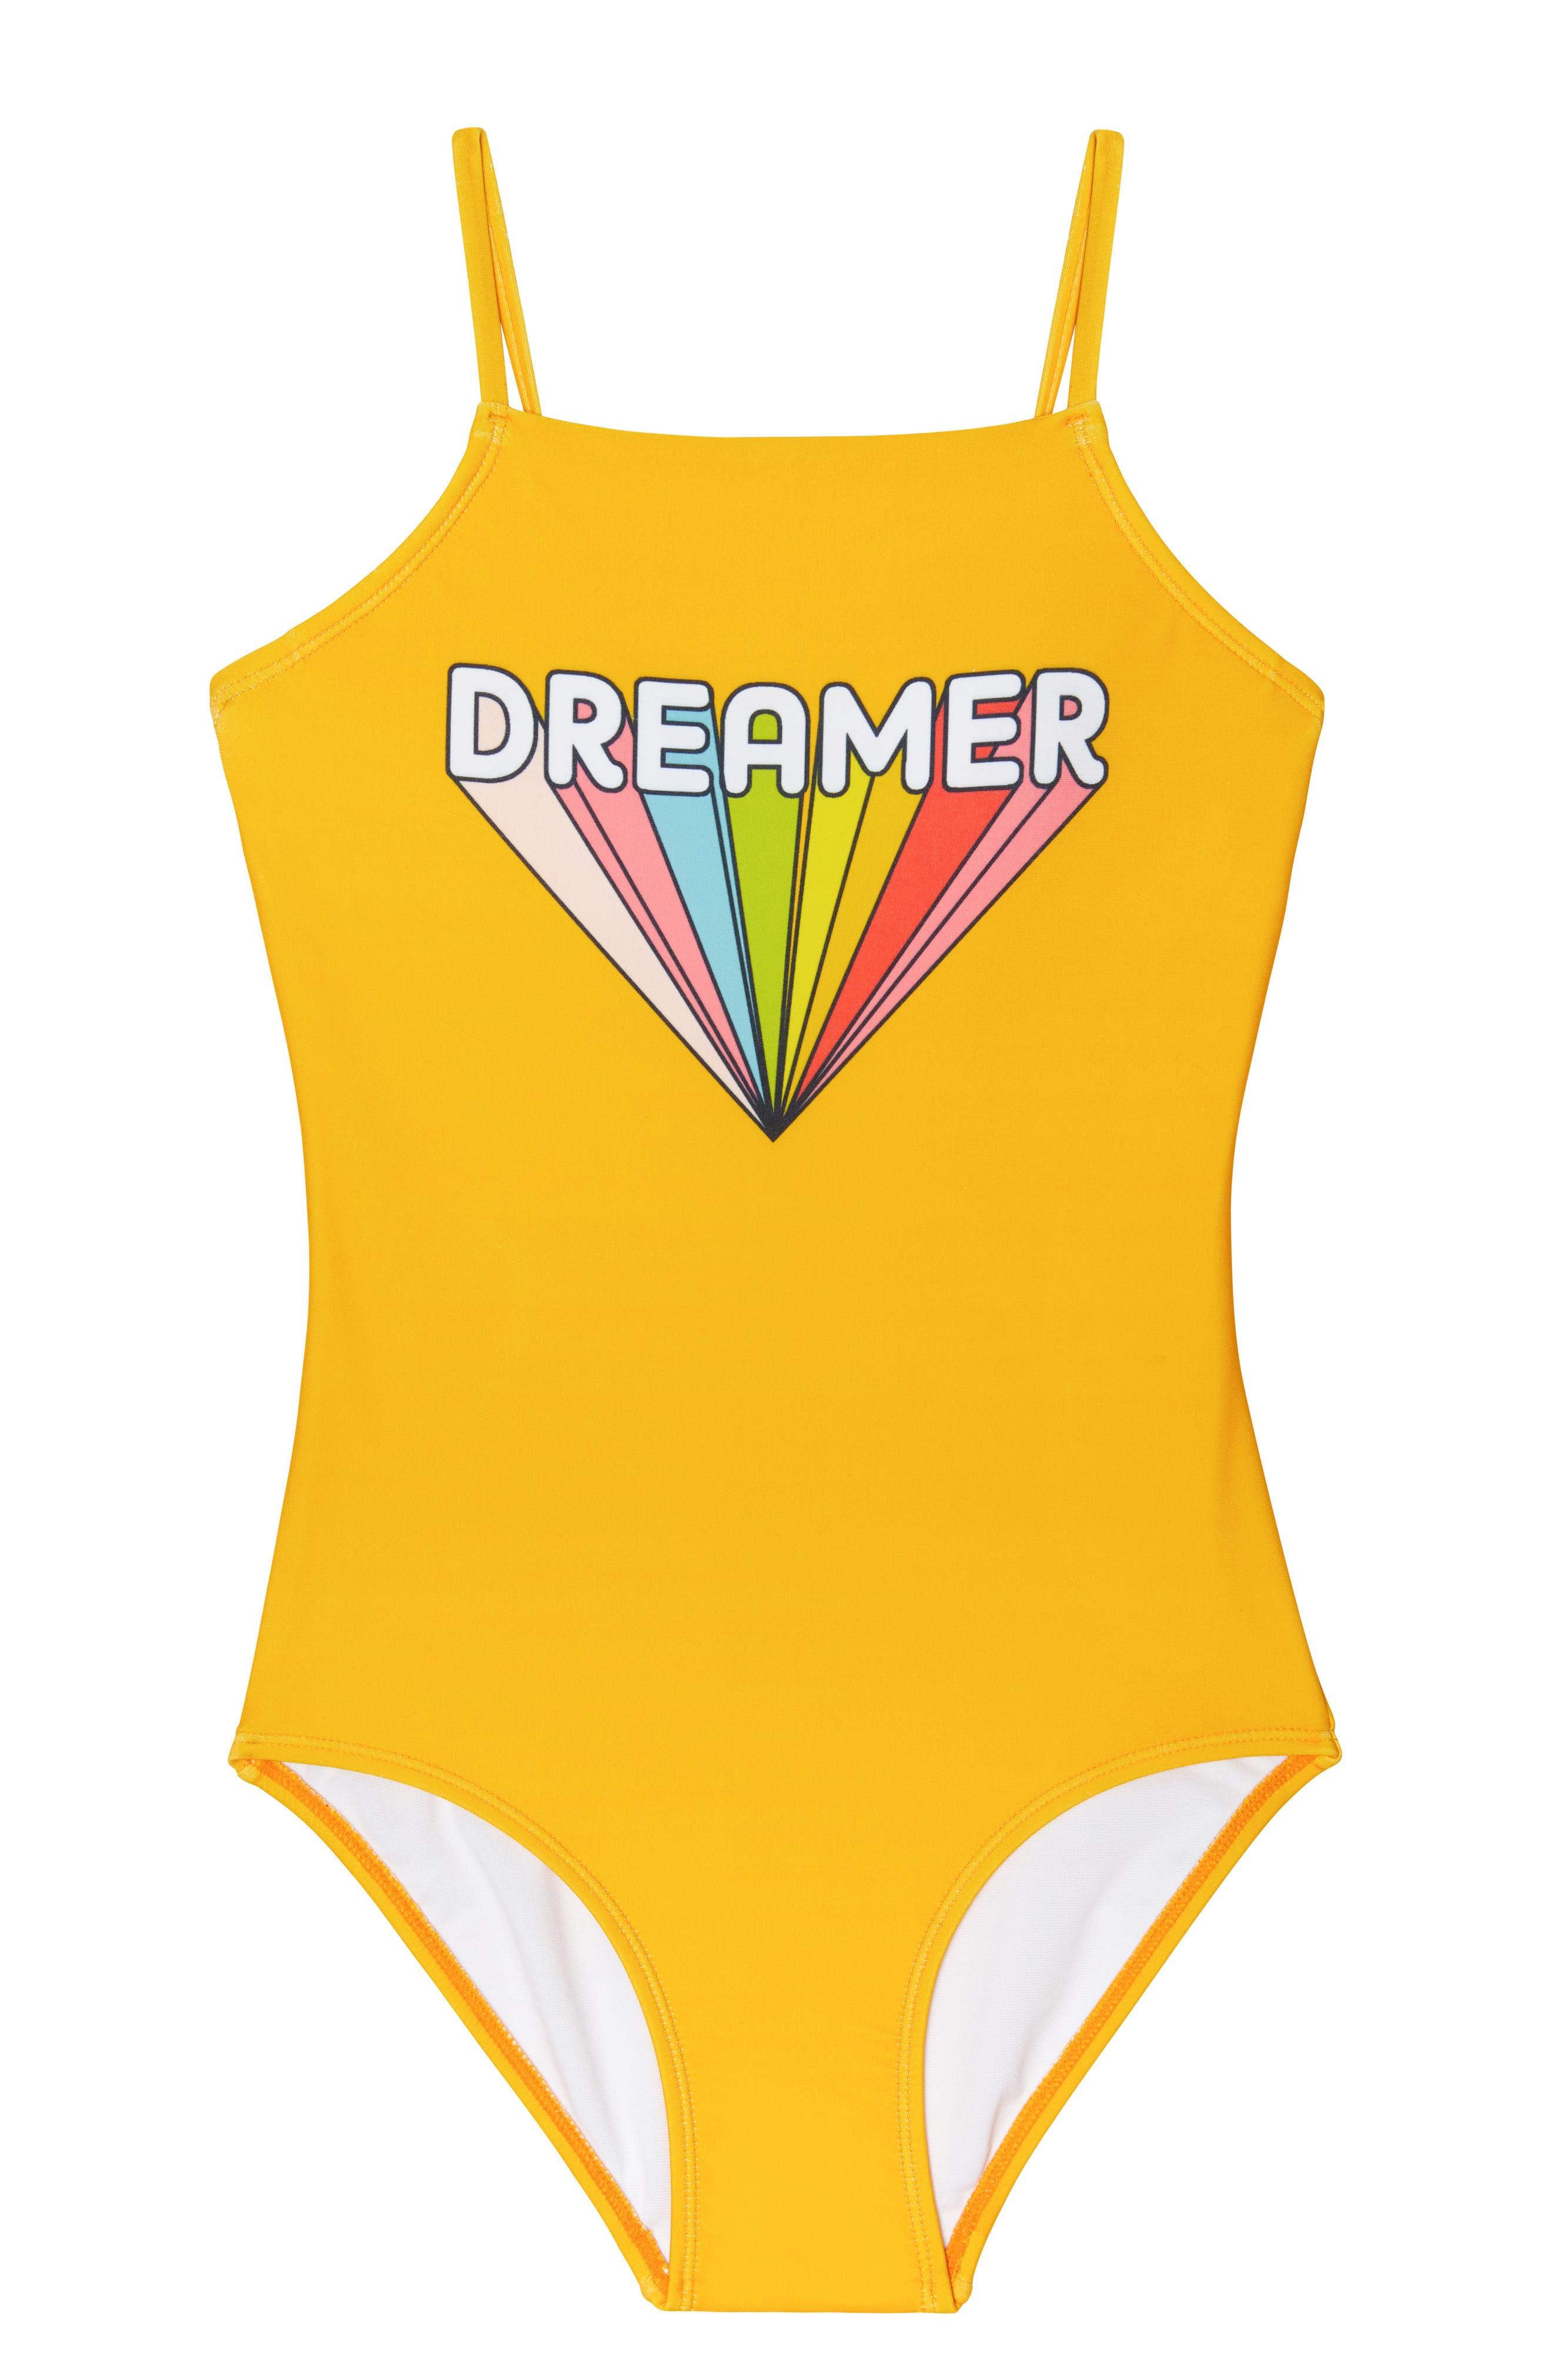 Girls Gossip Girl Dreamer OnePiece Swimsuit Size 14  Yellow